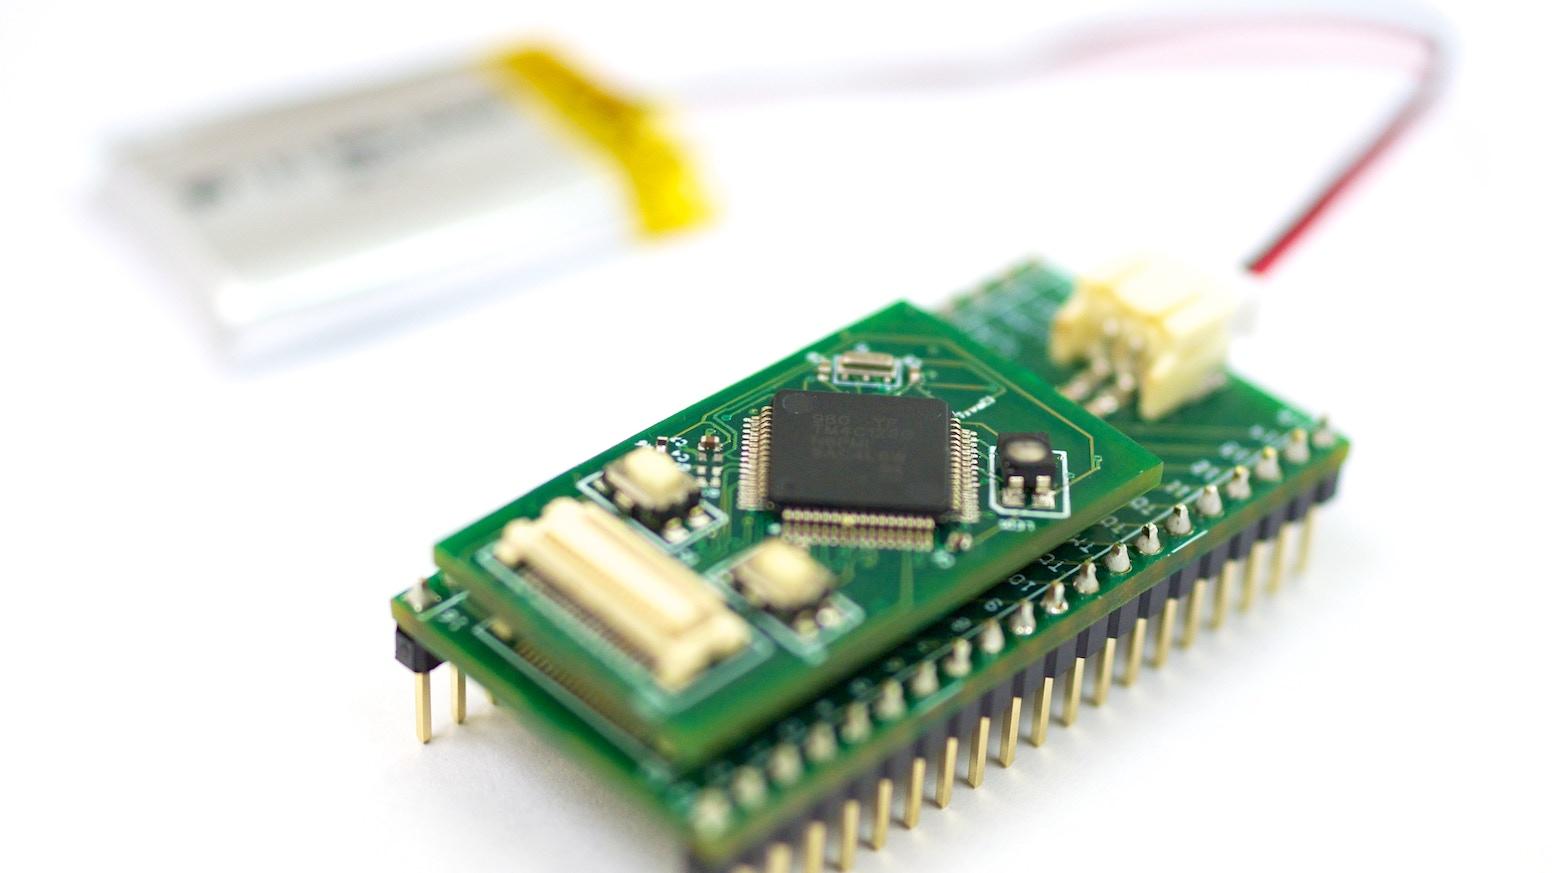 AttoDuino - Turbocharged, Wireless, Arduino Compatible by AttoDuino